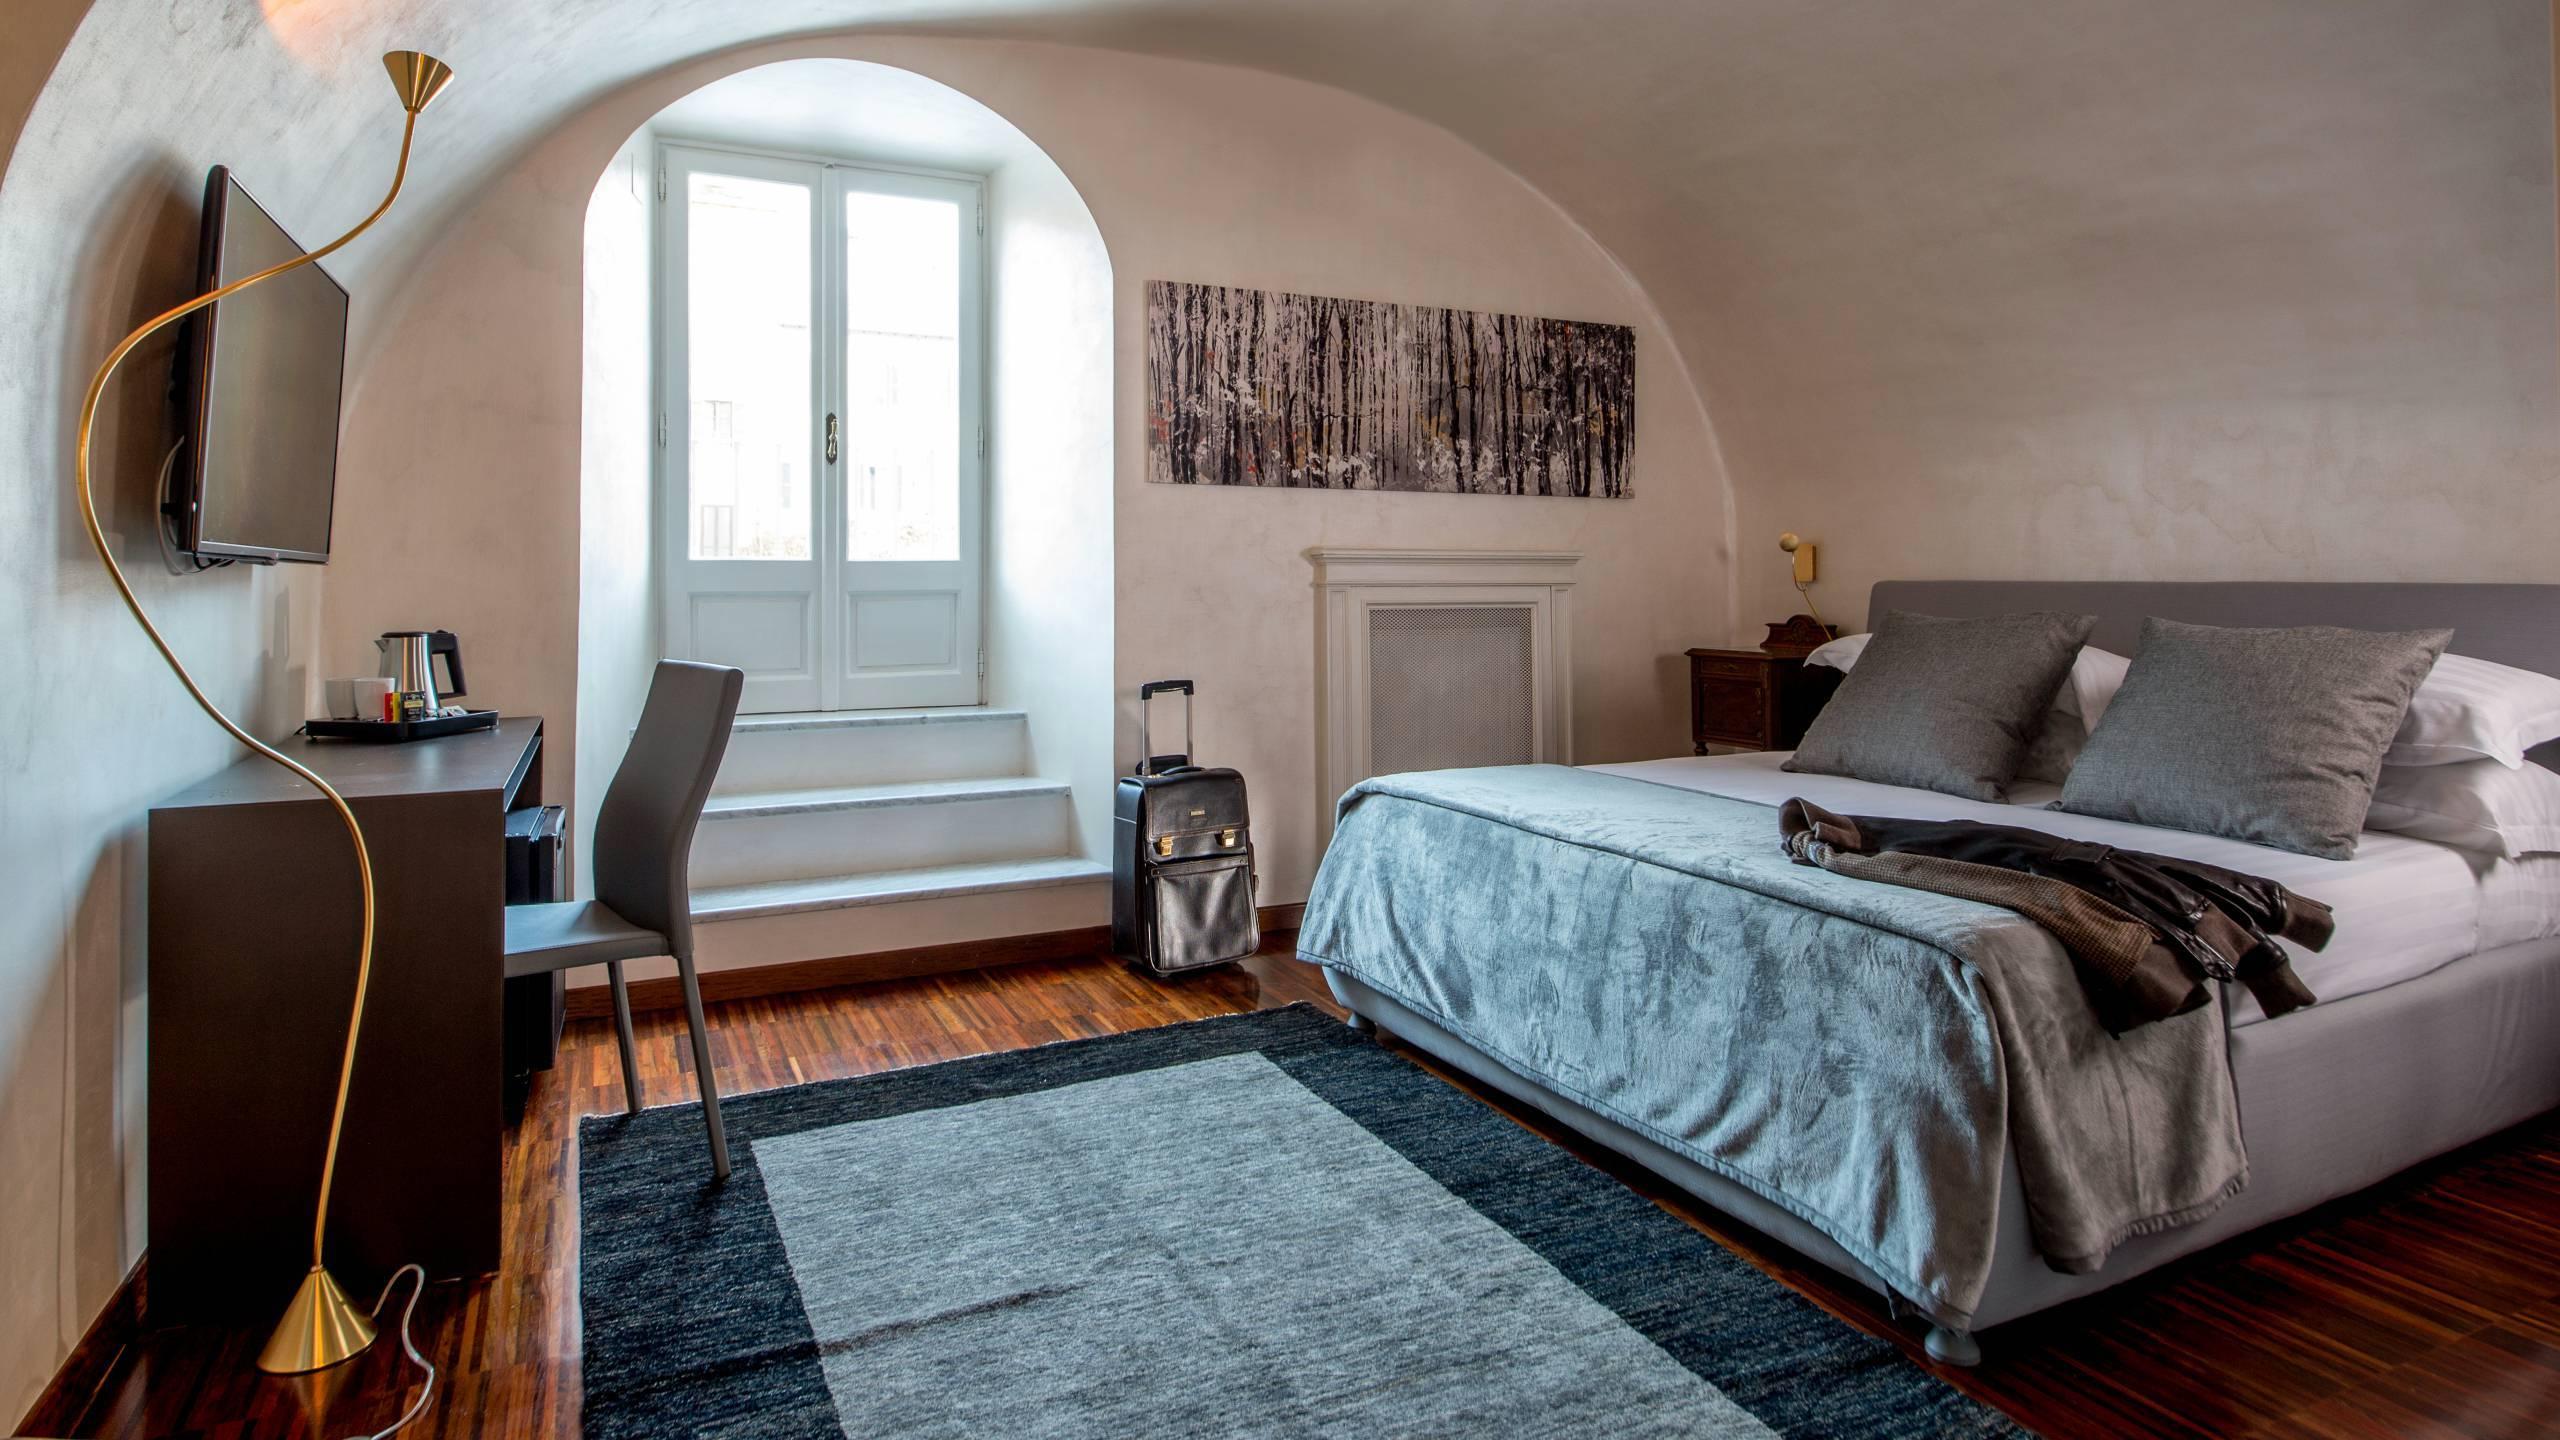 palazzo-de-cupis-roma-suite12